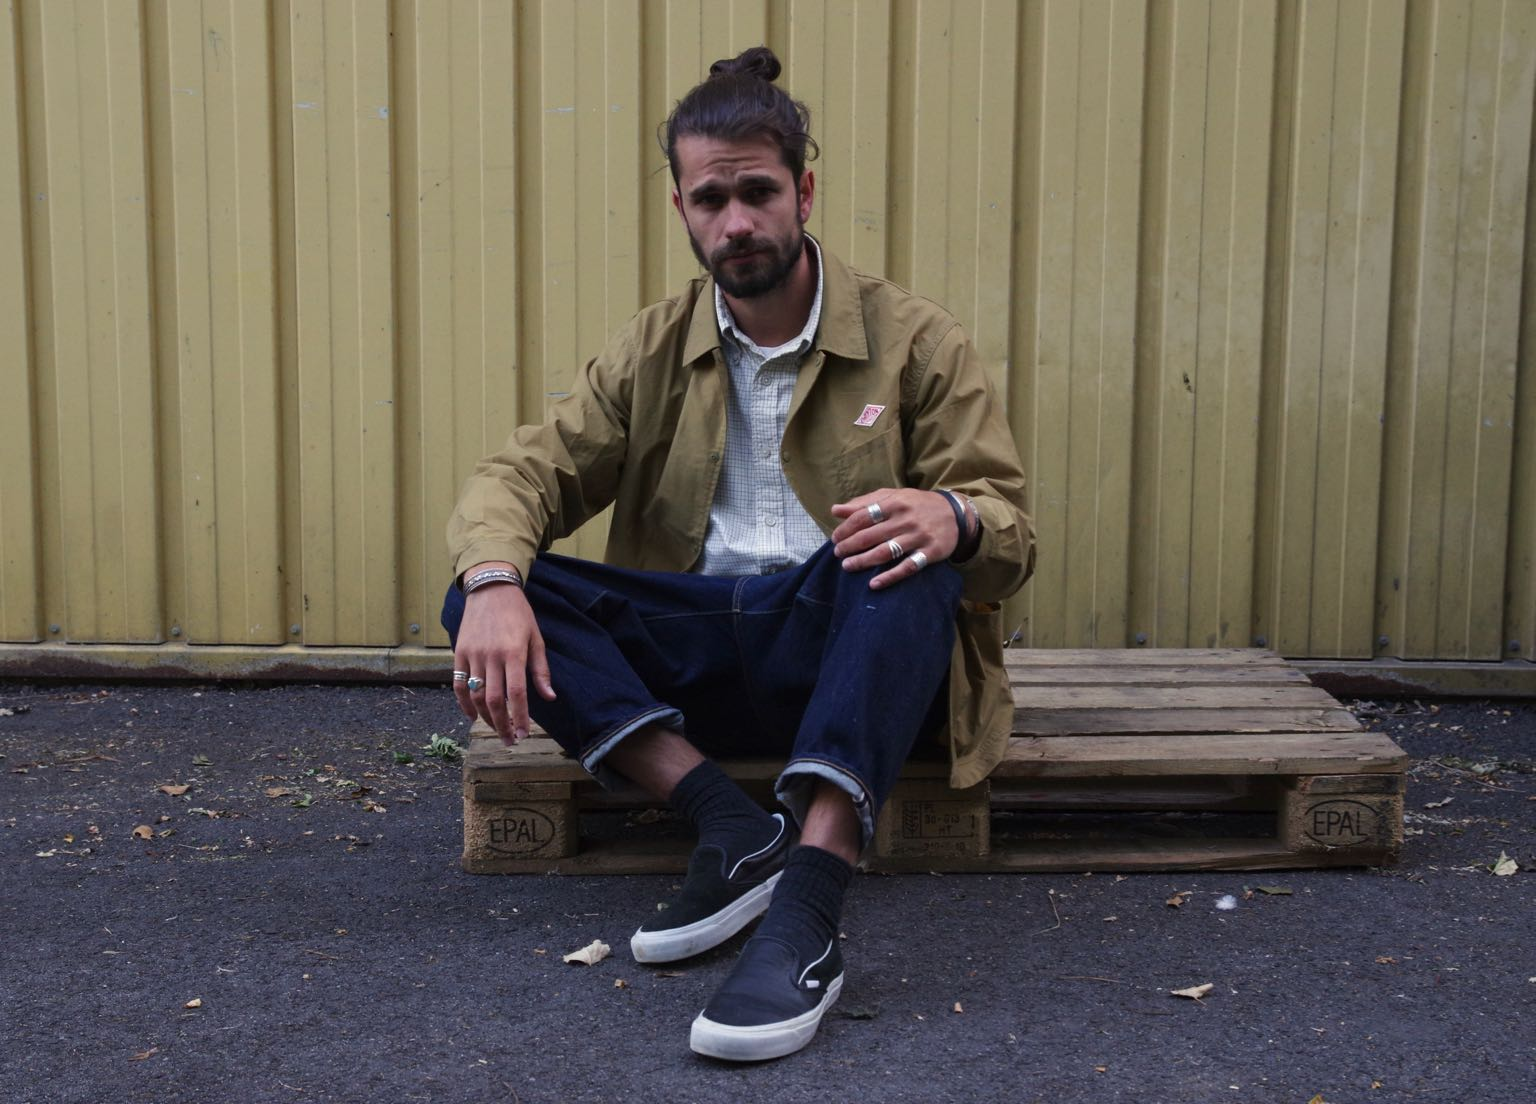 danton taffeta nylon jacket et magasin français reforme store